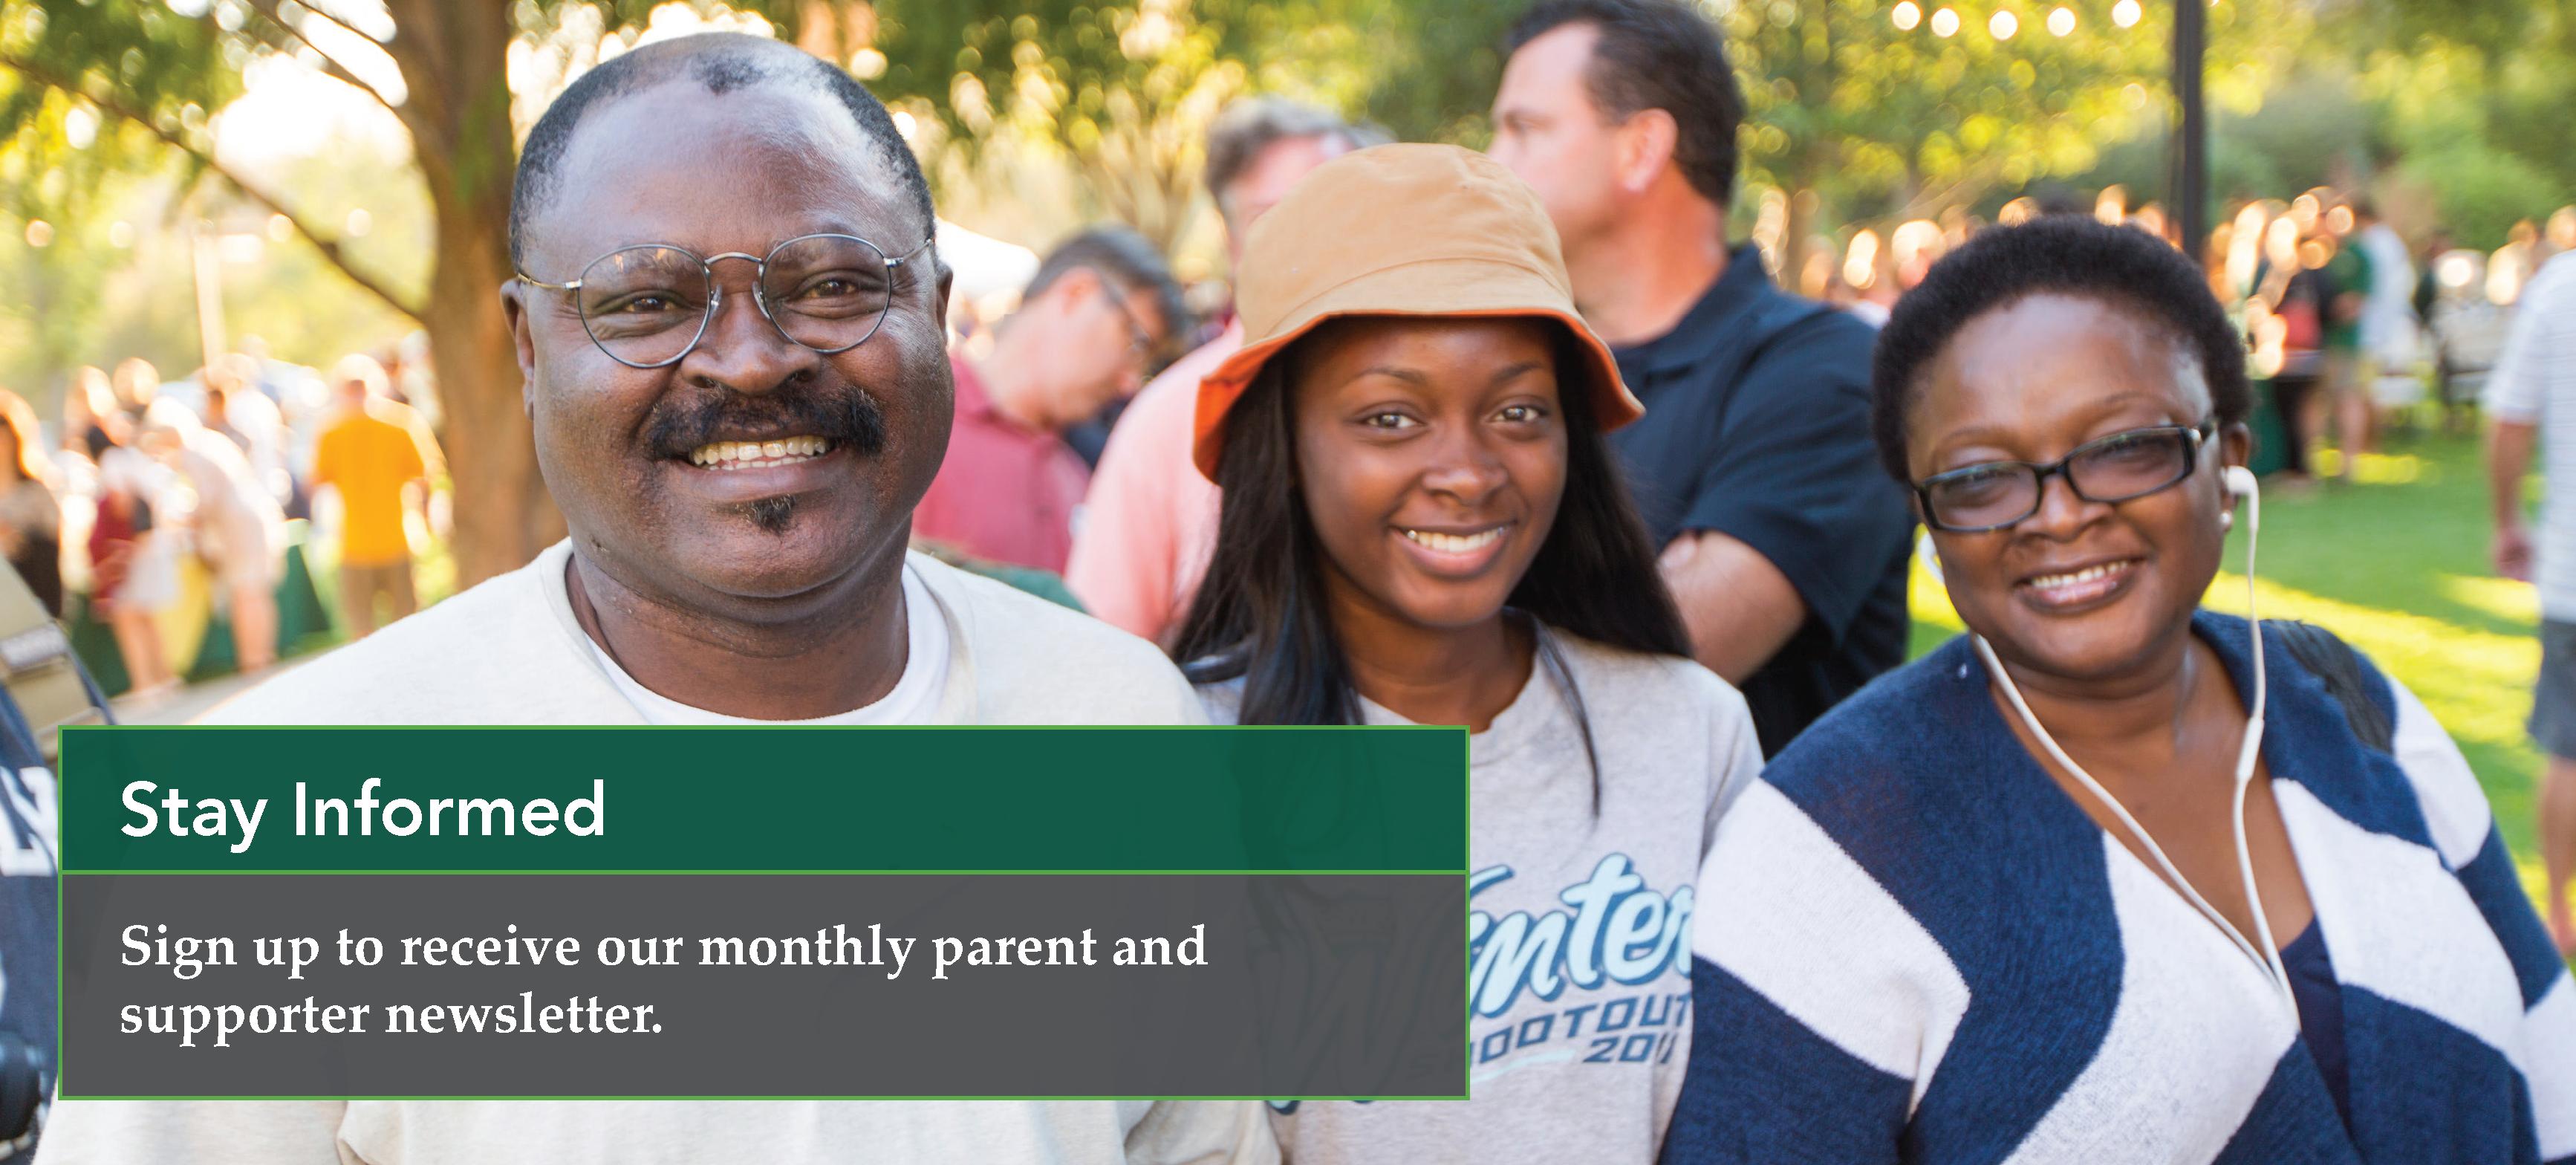 home parent and family programs cal poly san luis obispo